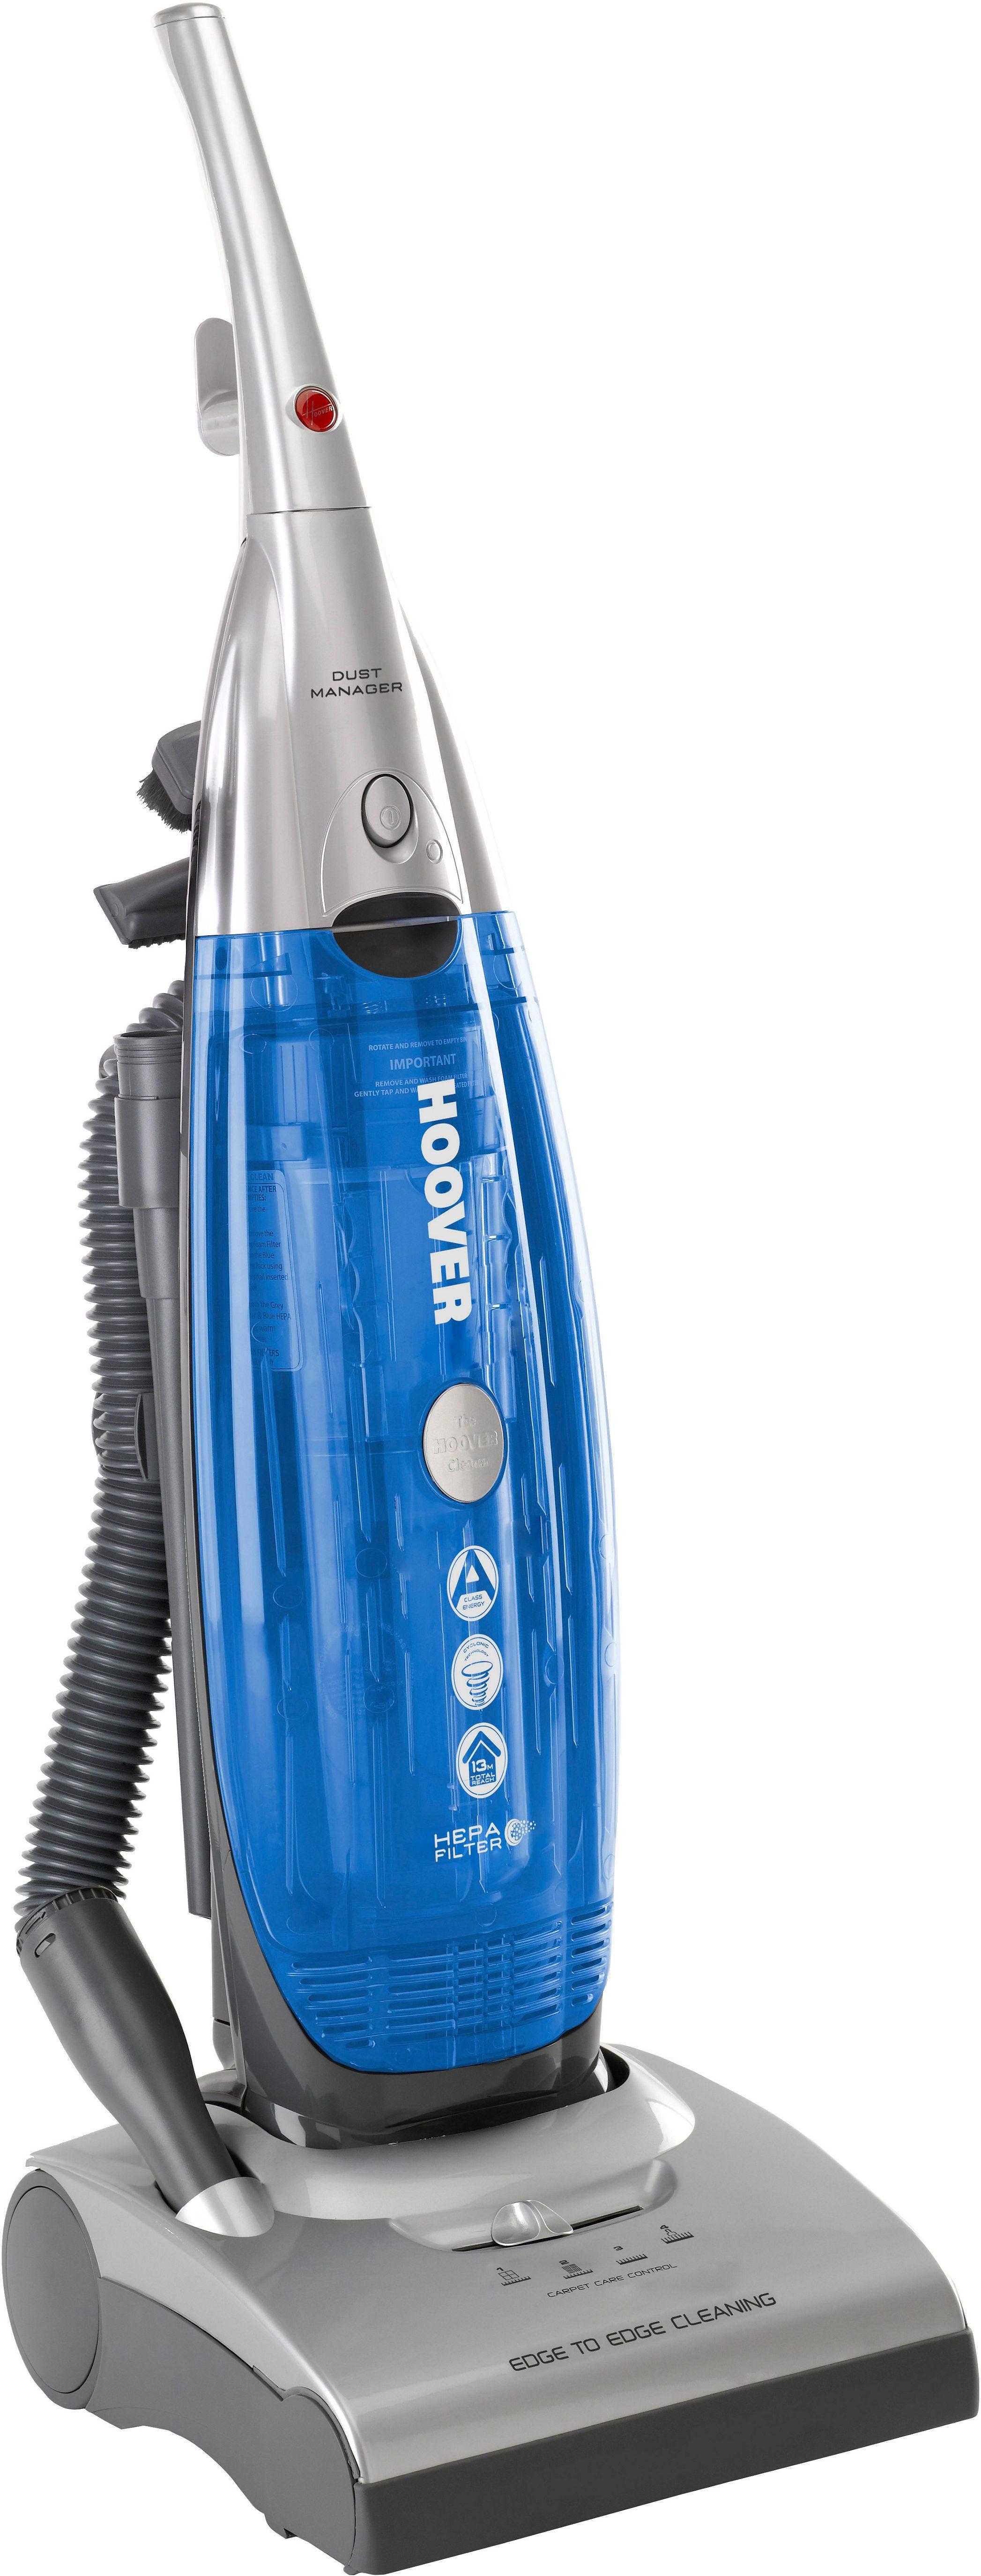 Hoover Bürstsauger Dustmanager DM71_DM01, Energieeffizienzklasse A